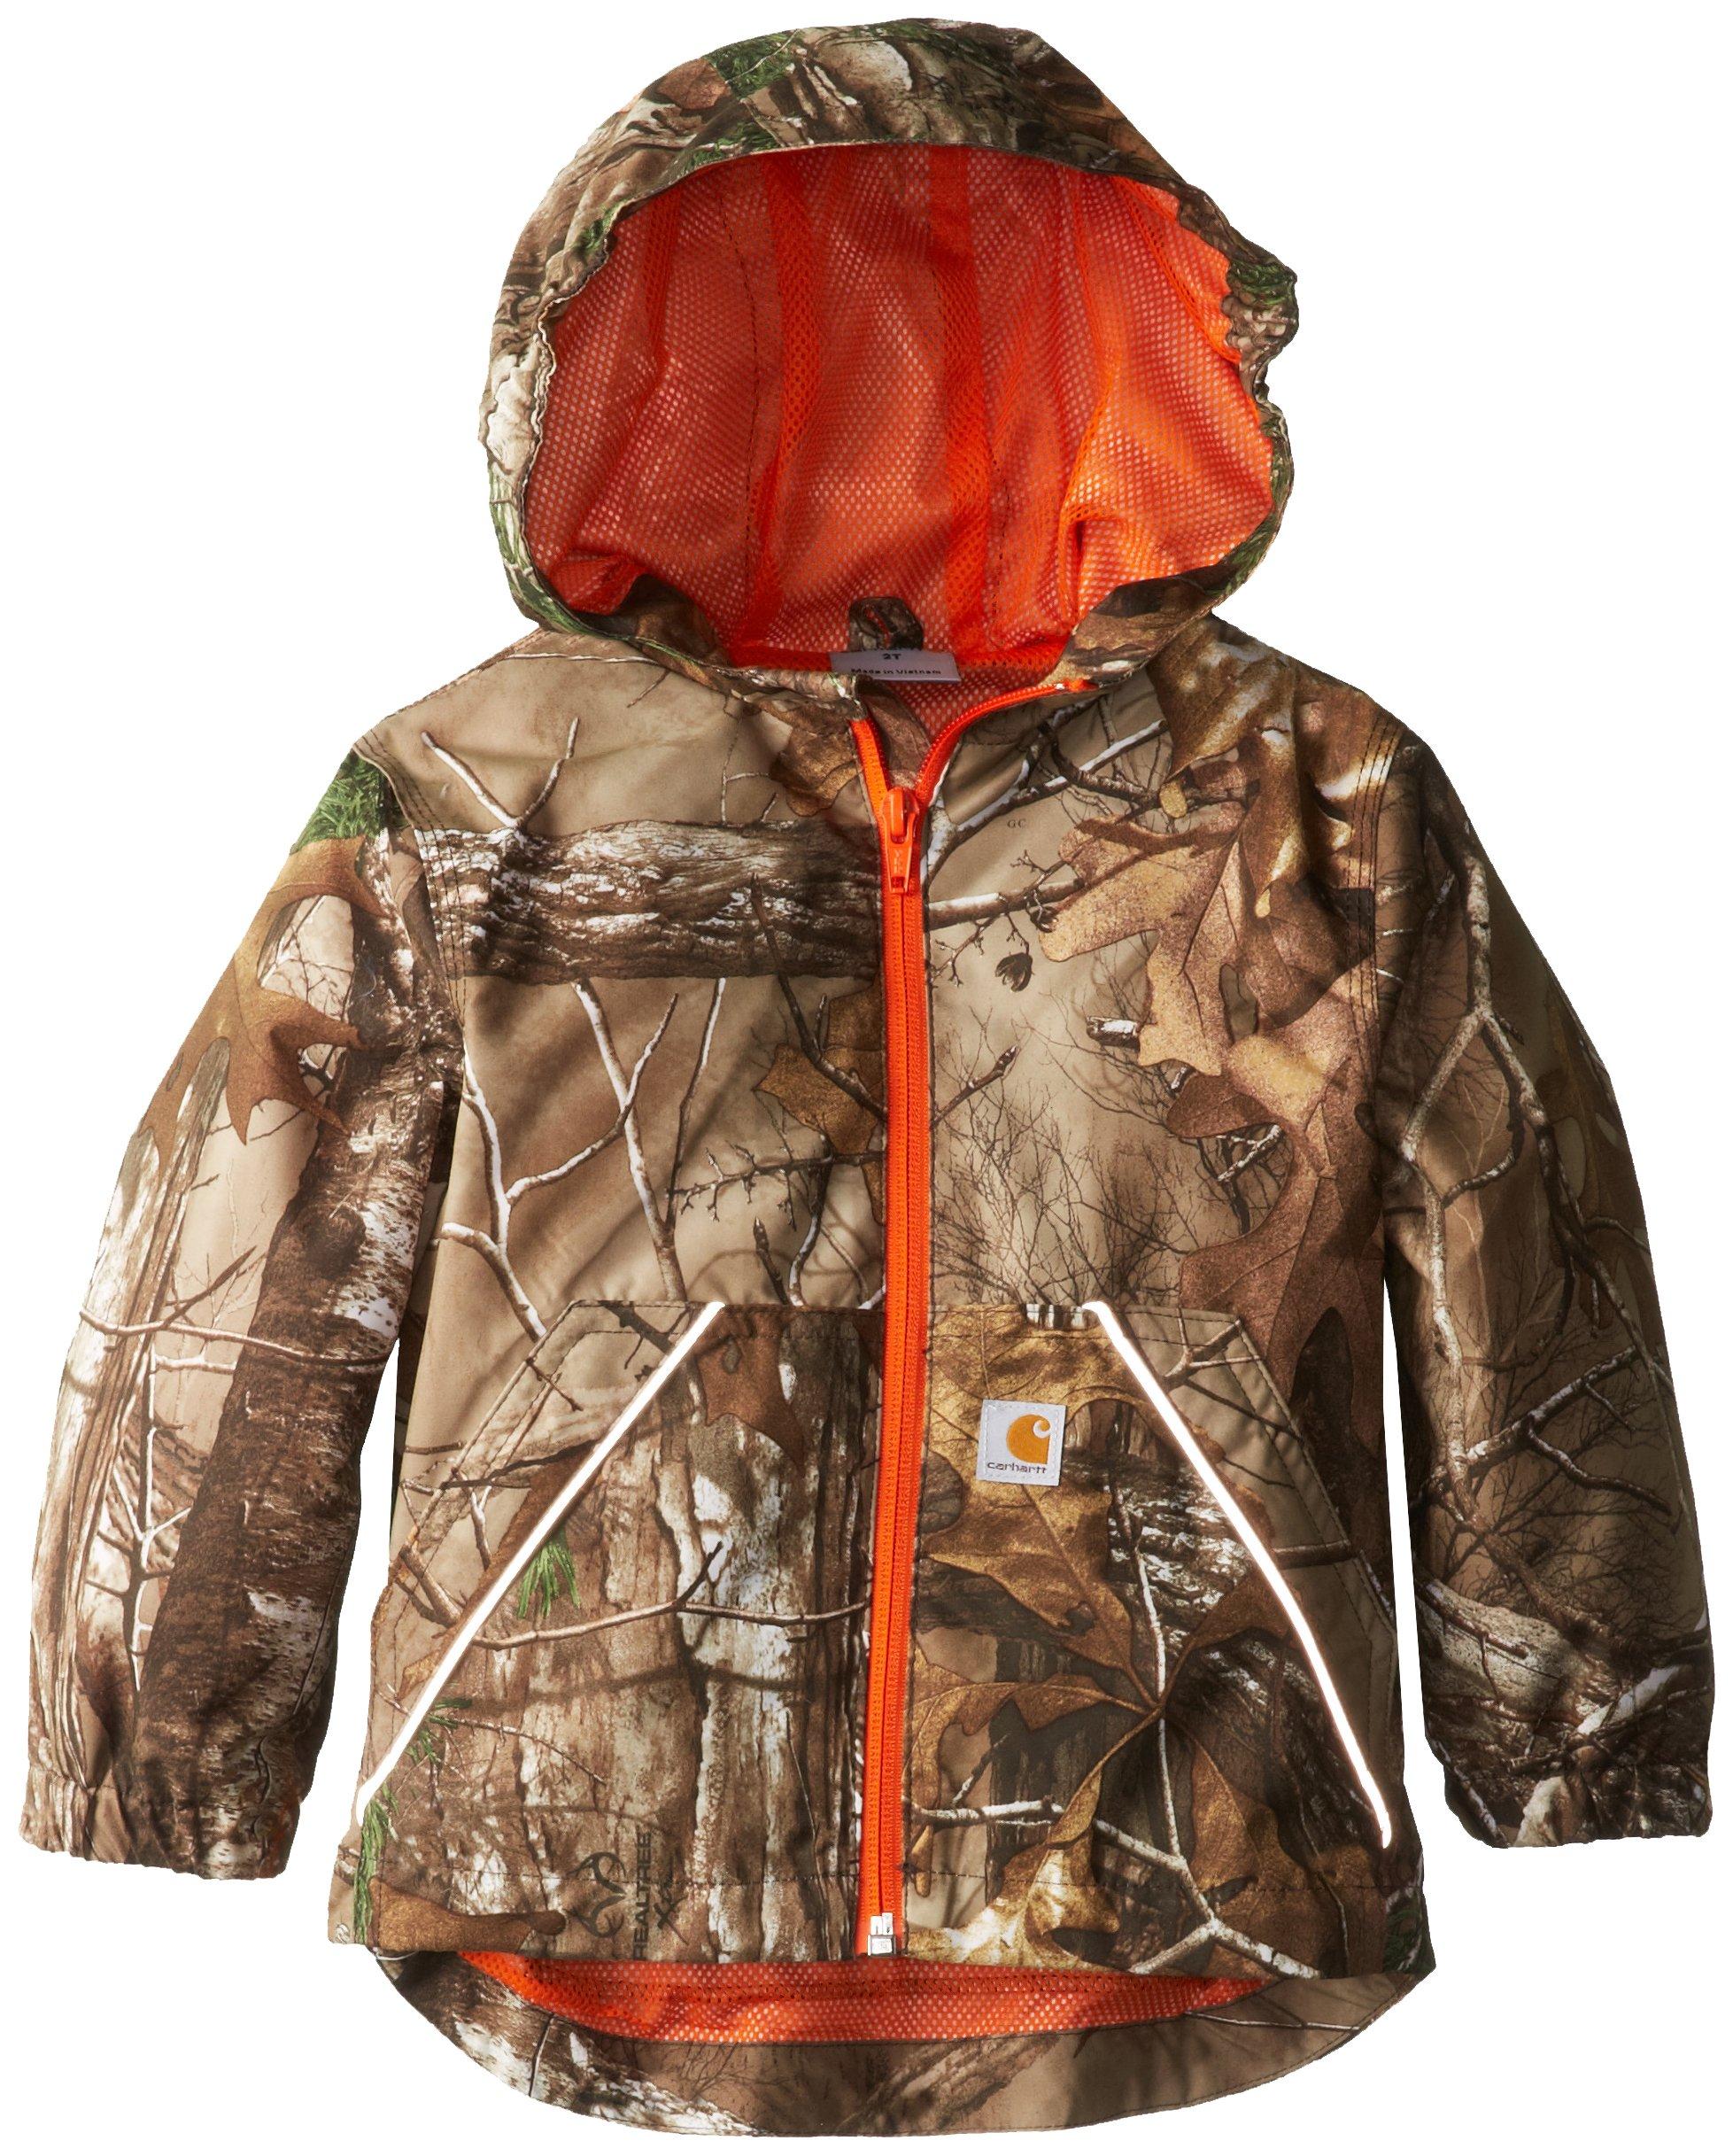 Carhartt Little Boys' Packable Work Camo Hooded Rain Jacket, Realtree Xtra, X-Small/6